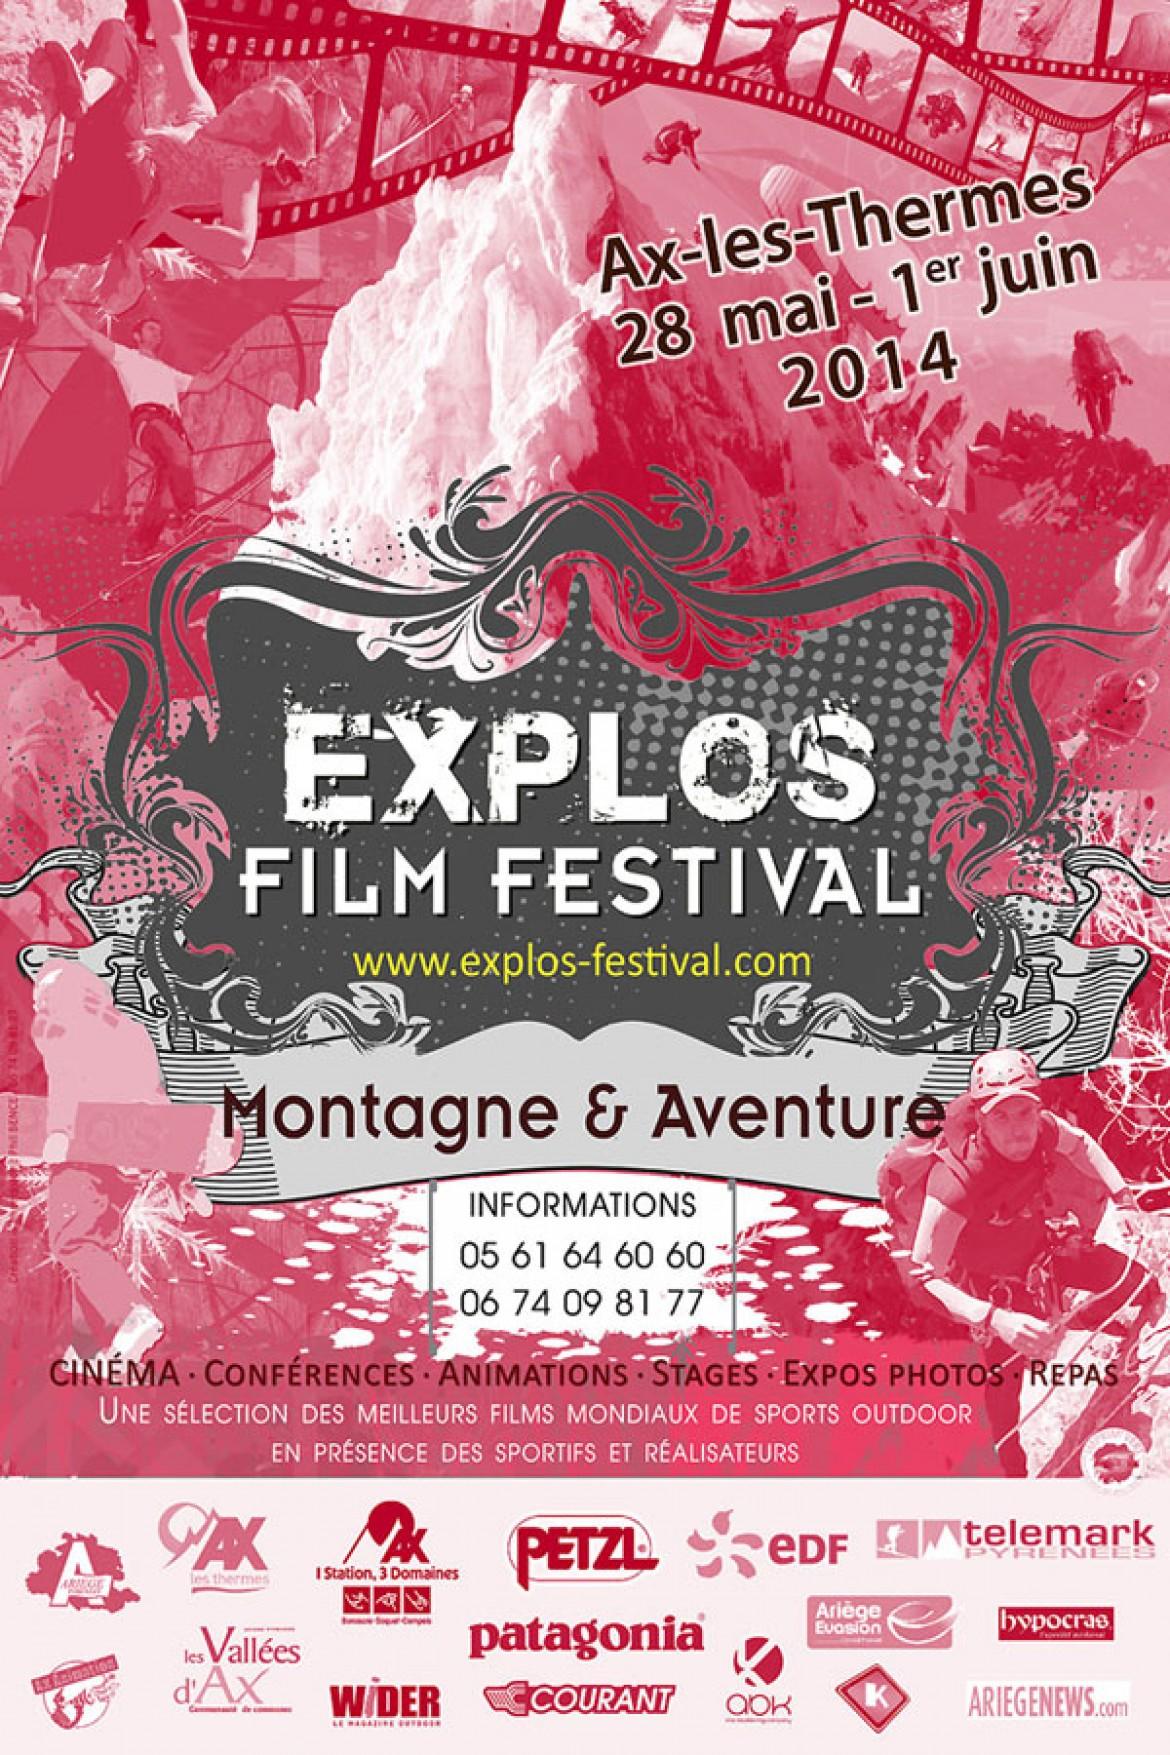 EXPLOS Film Festival 2014, du 28 mai au 1er juin